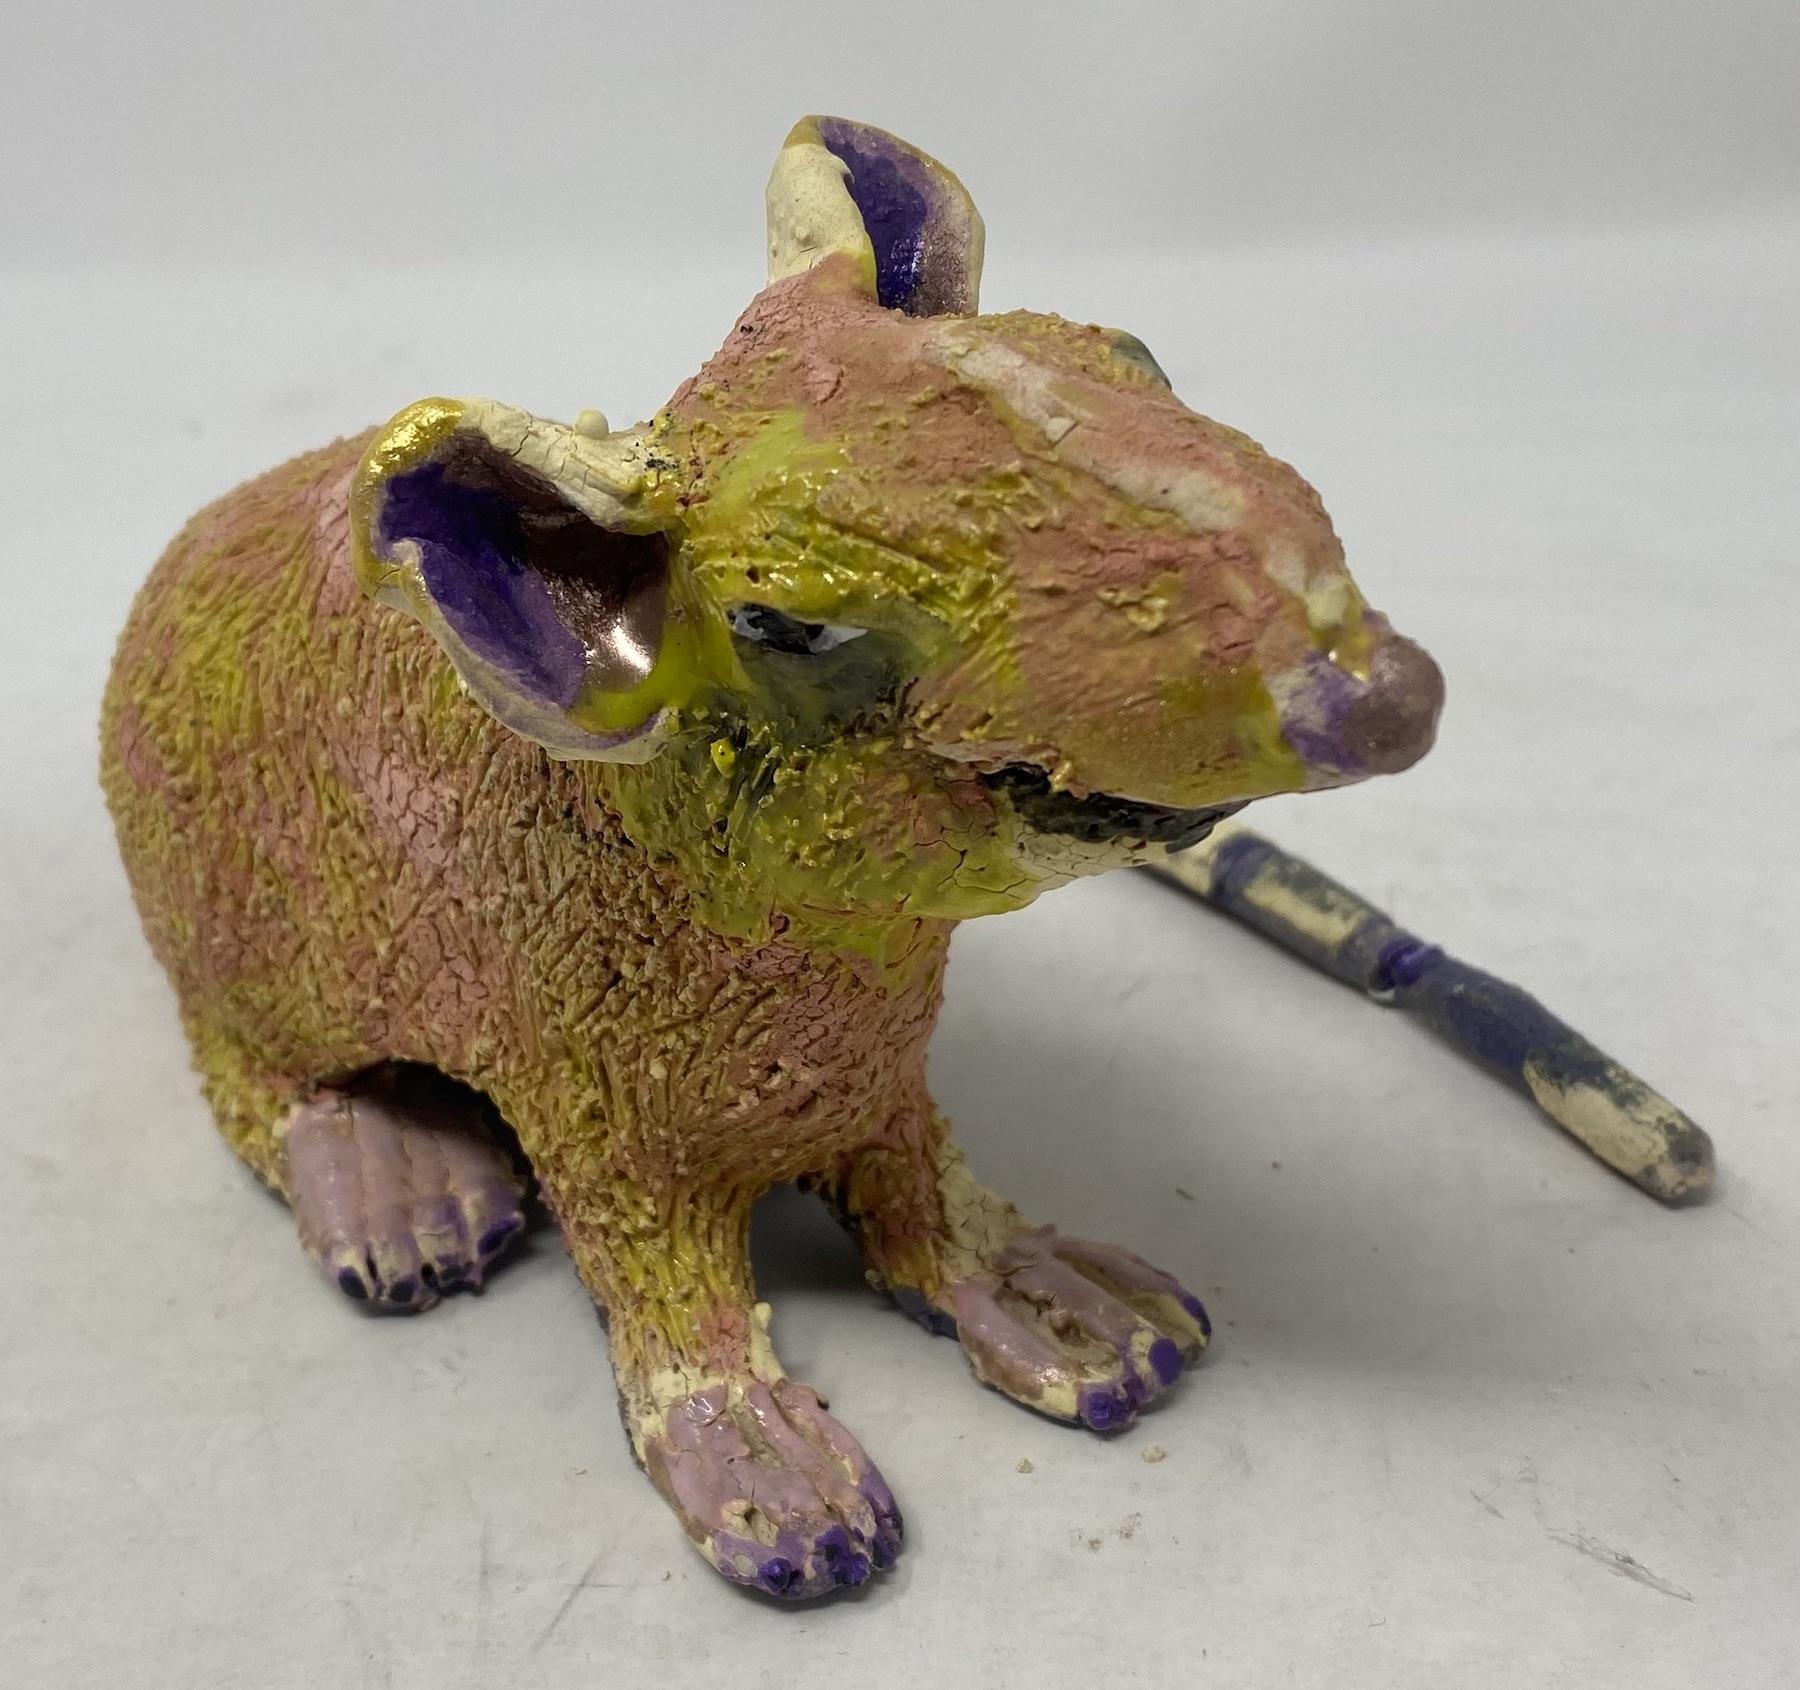 Dandelion Rat